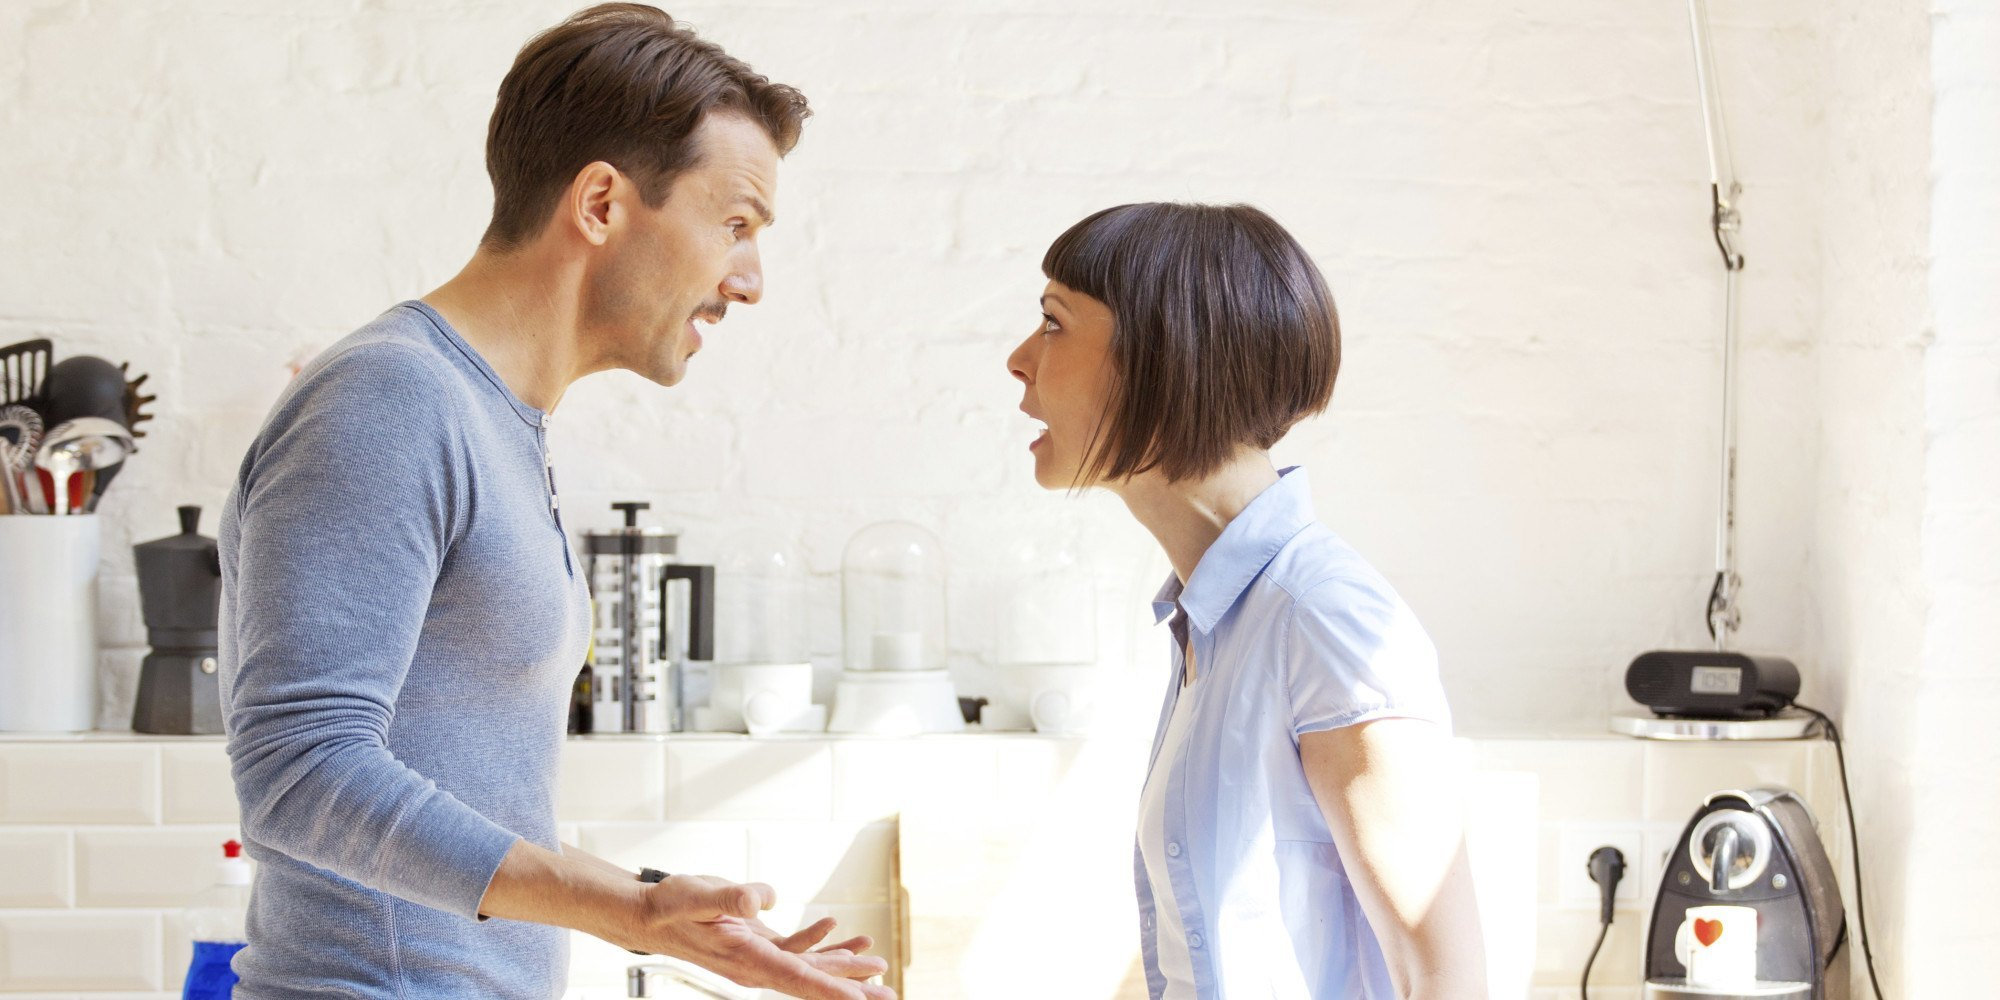 je ex-vriendje dating iemand anders High Net Worth dating service